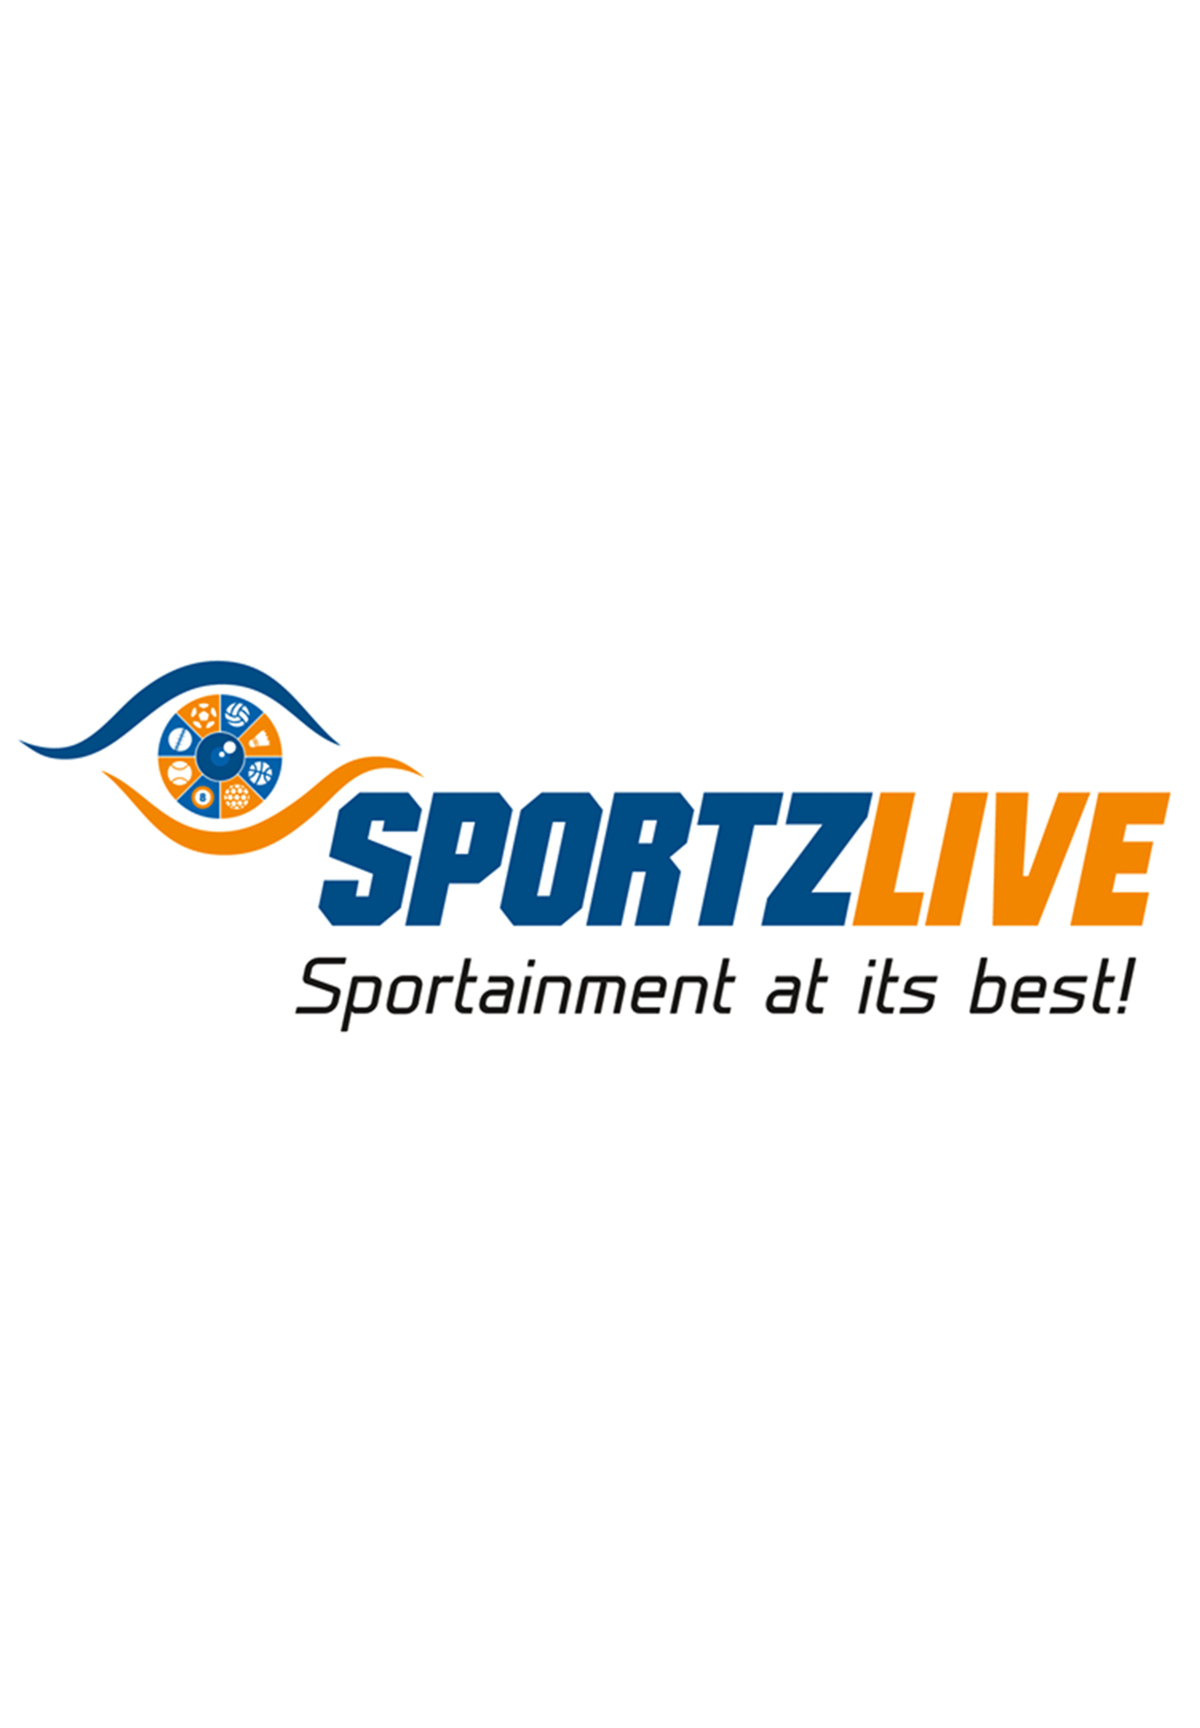 Actofit Sportzlive